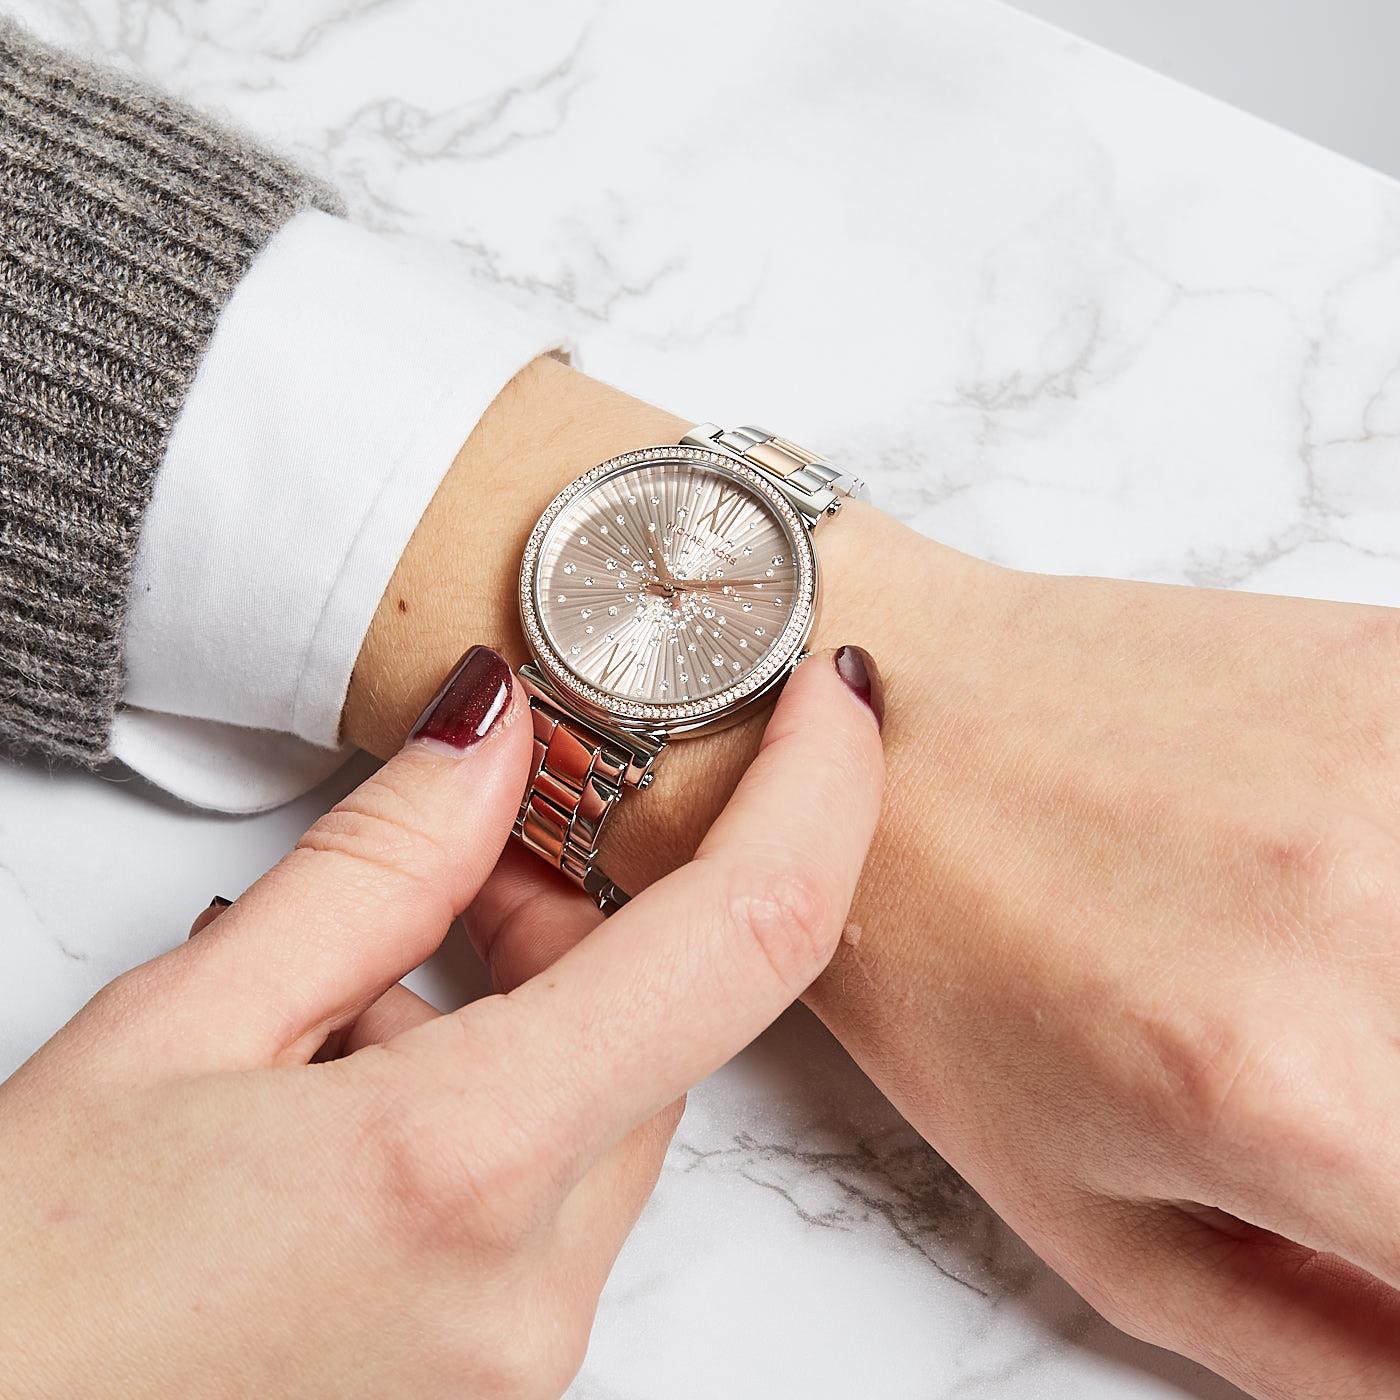 hodinky-nepostradatelny-doplnek-ktere-trendy-vladnou-roku-2019-22